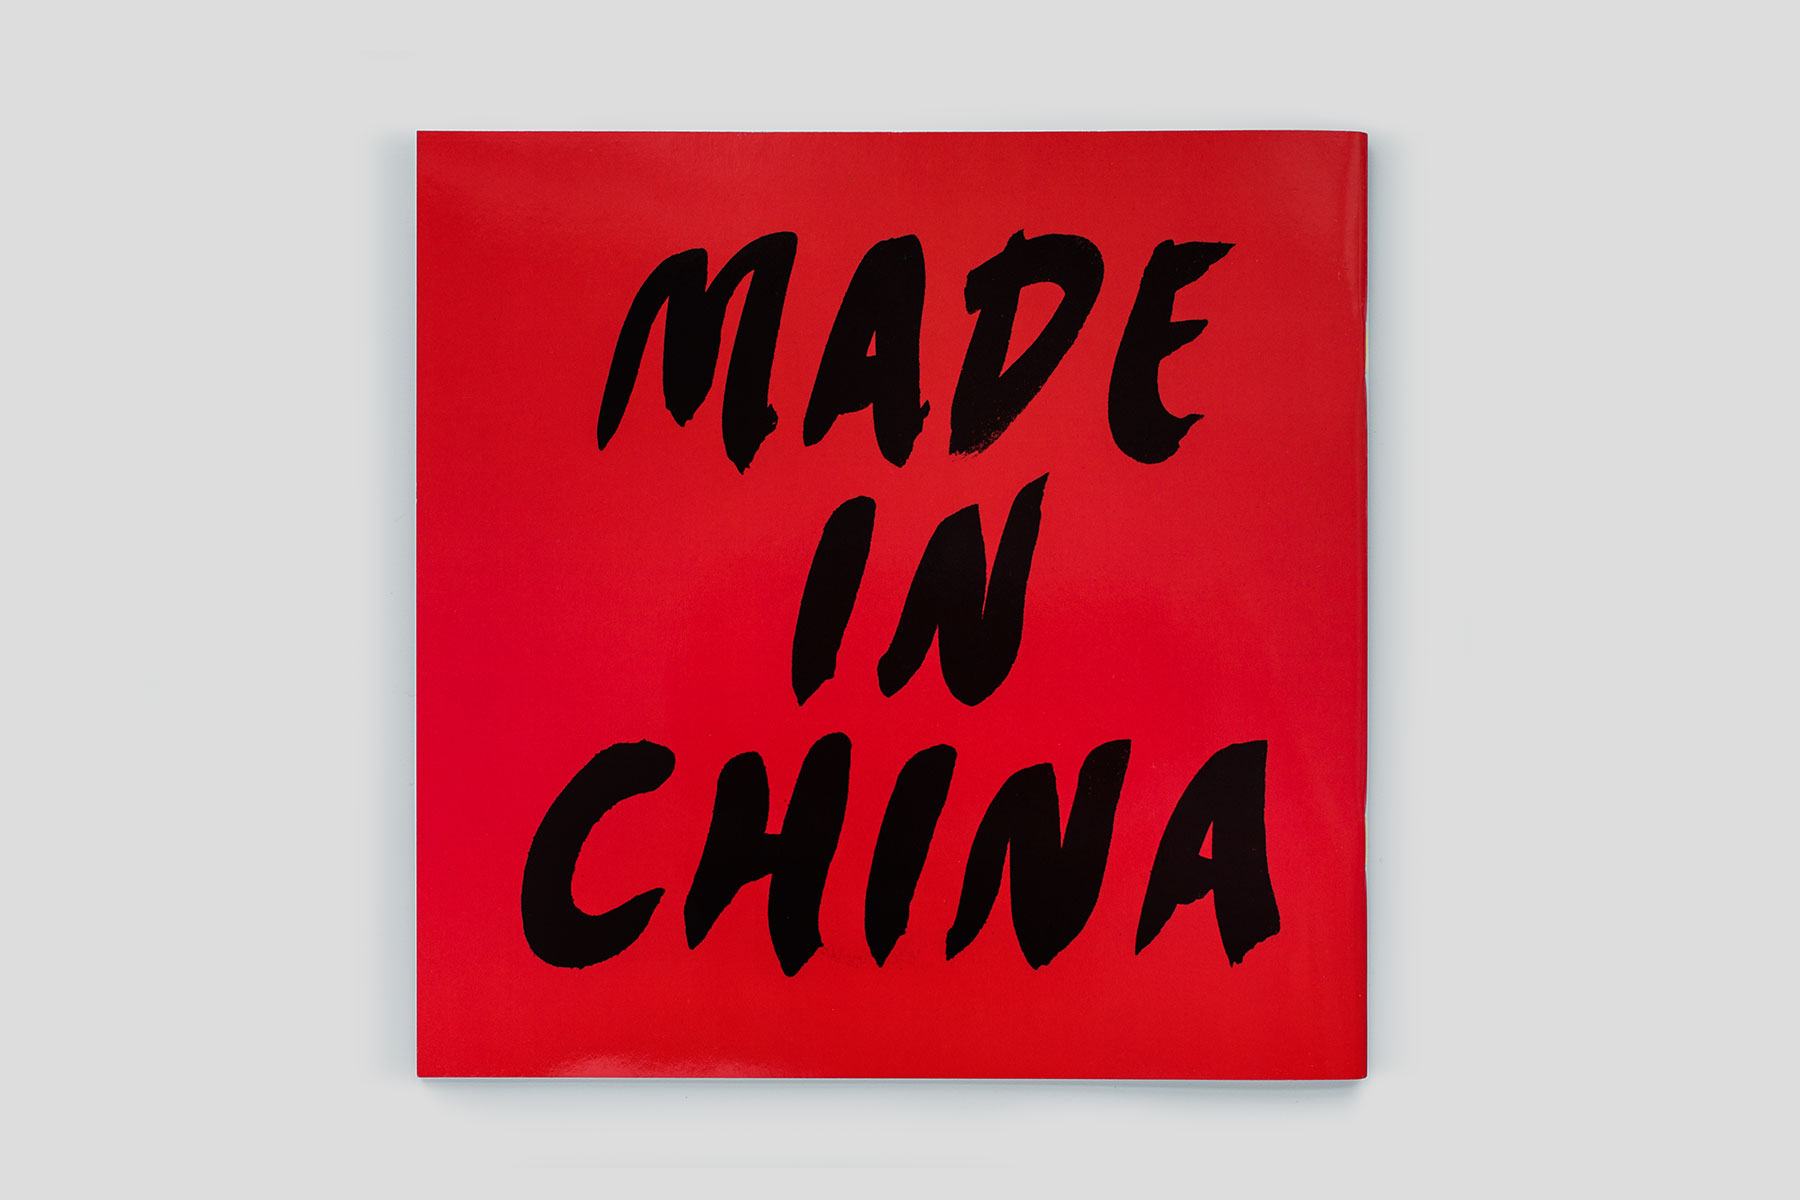 Made_in_China_0001_2.jpg